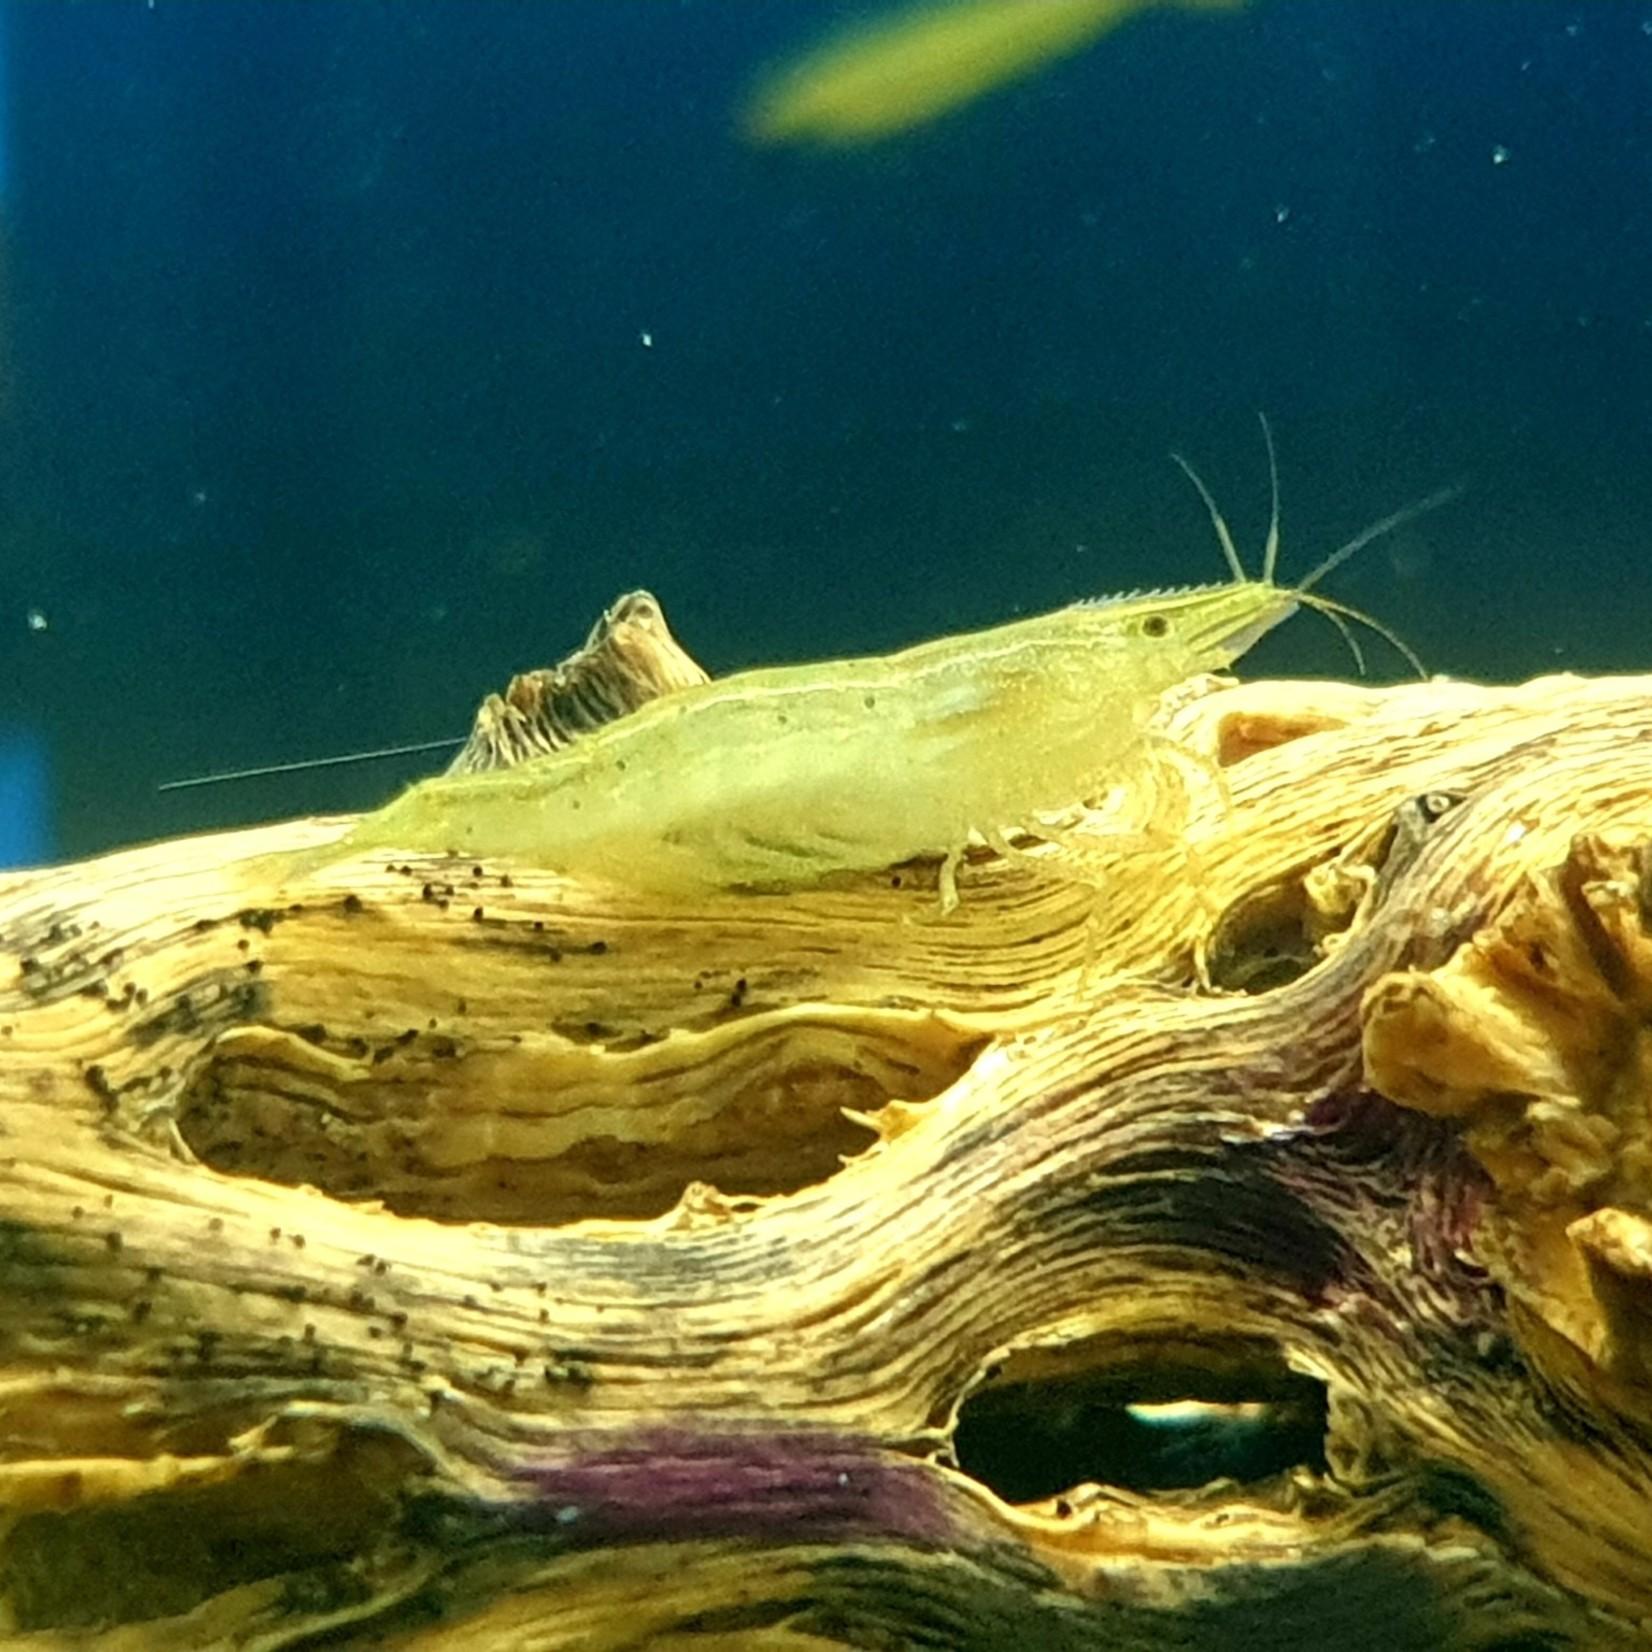 Bubba's Shrimps Caridina babaulti var. Green